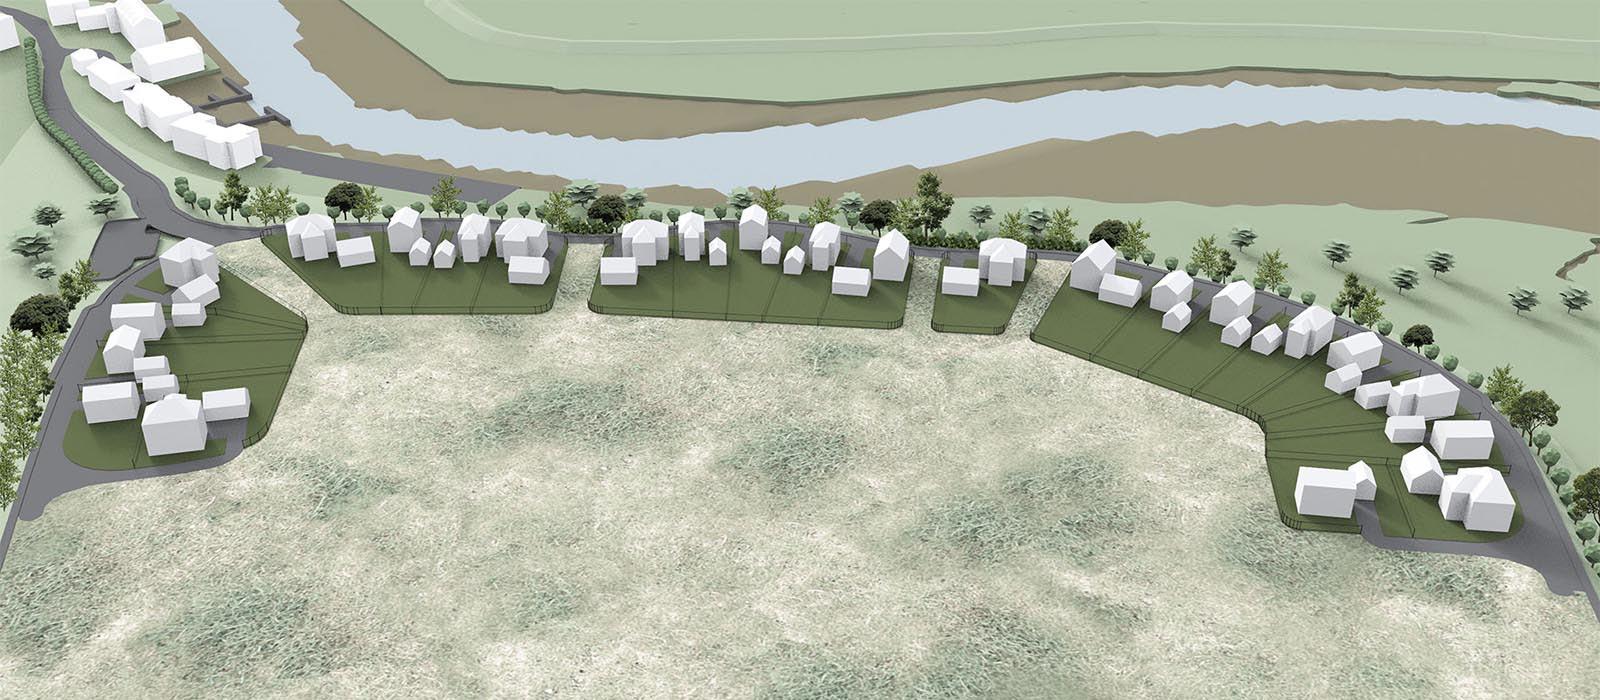 conyer creek architects design